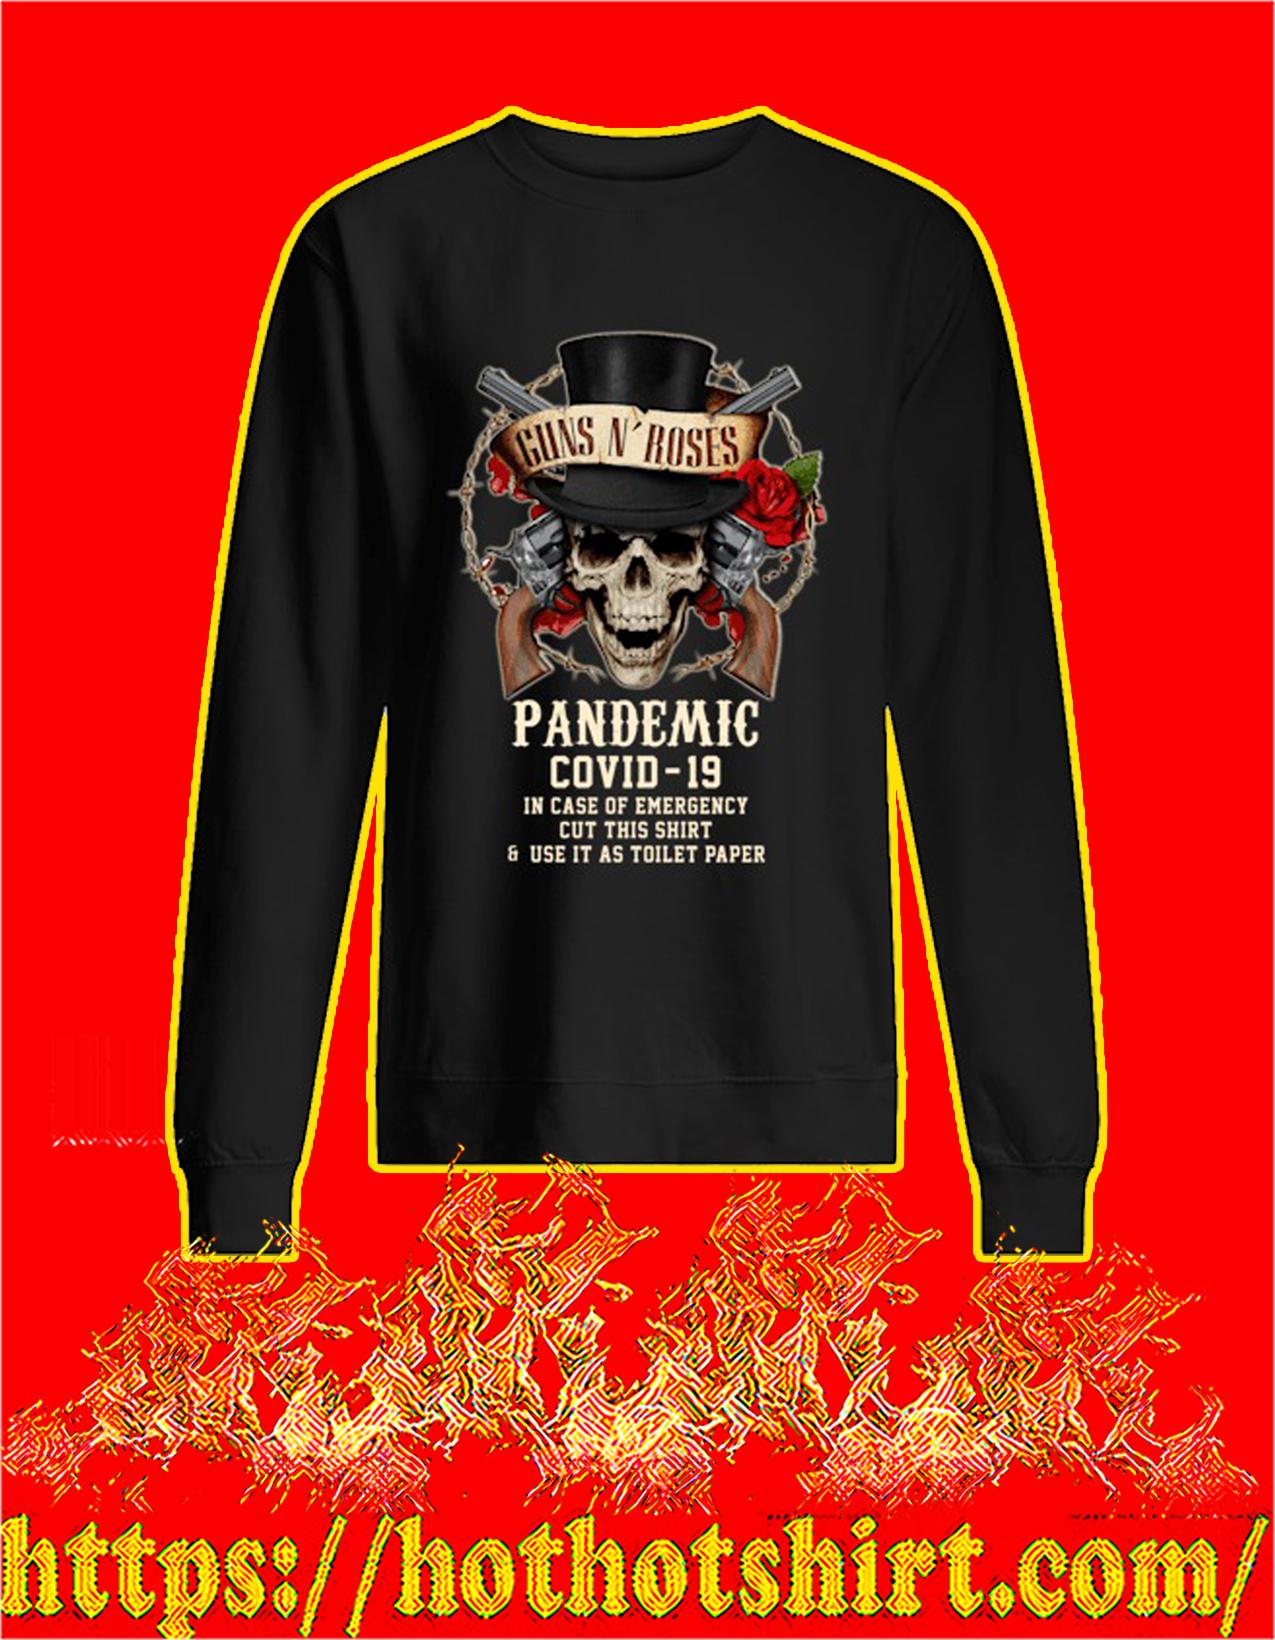 Guns n' rose pandemic covid 19 sweatshirt